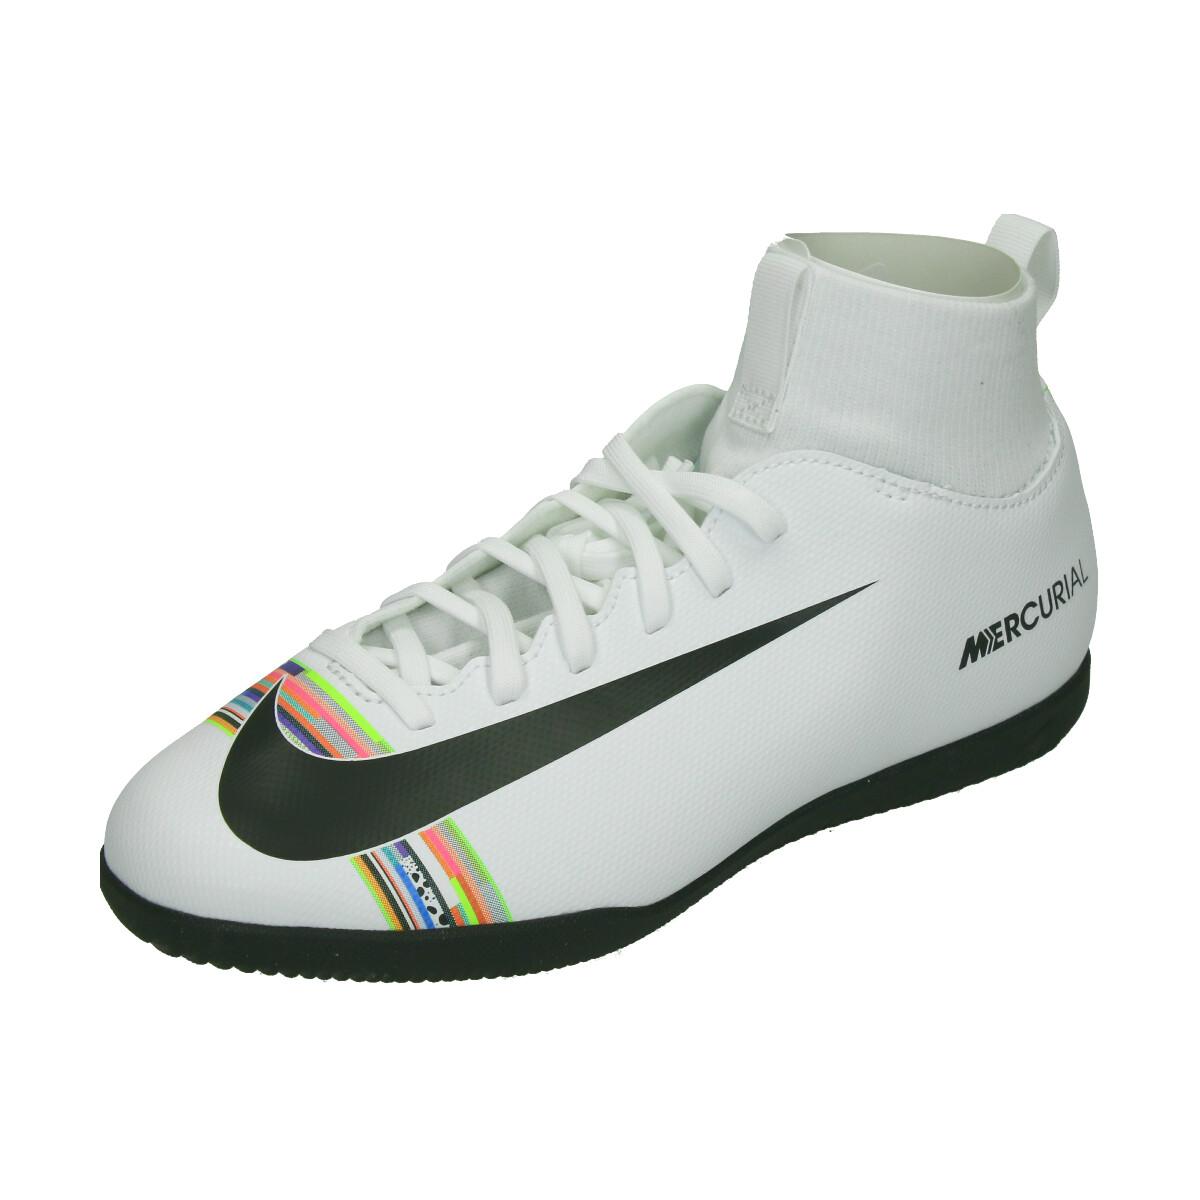 best service b25aa ee8ad Nike Mercurial Superfly X VI Club Indoor Junior